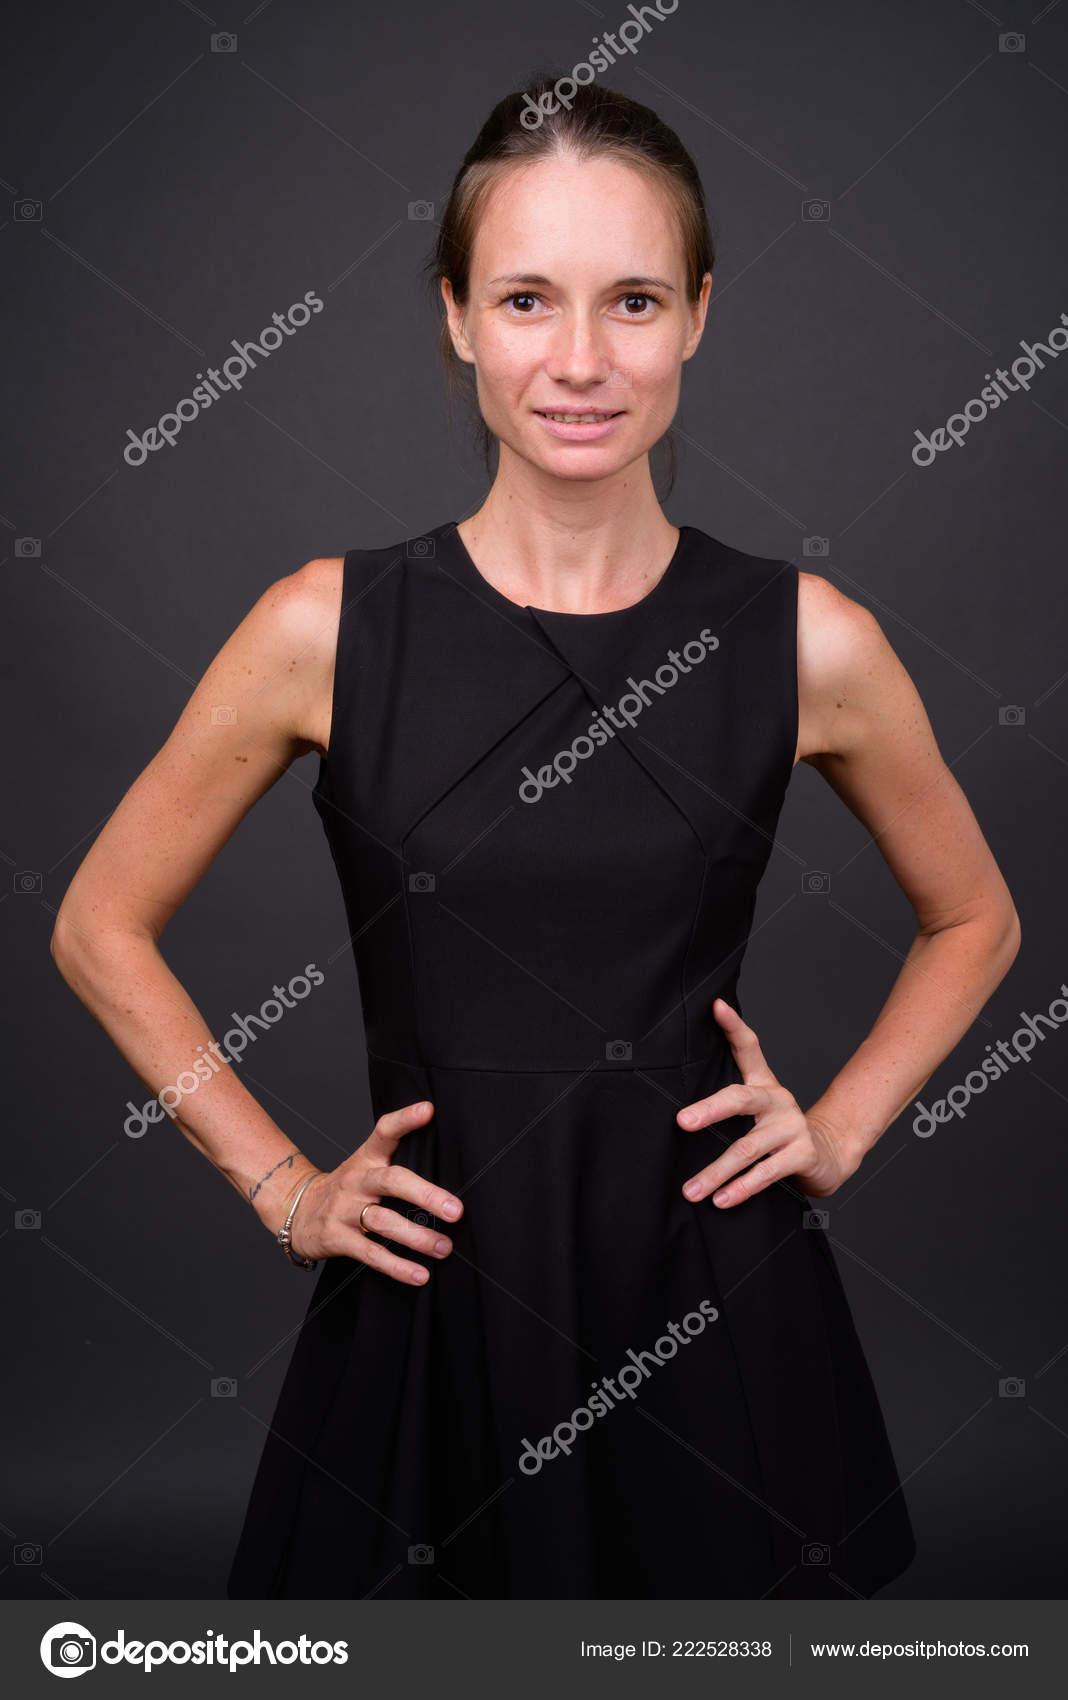 18a2ed8e8b8 Studio shot of beautiful woman wearing black sleeveless dress against gray  background — Photo by amazingmikael